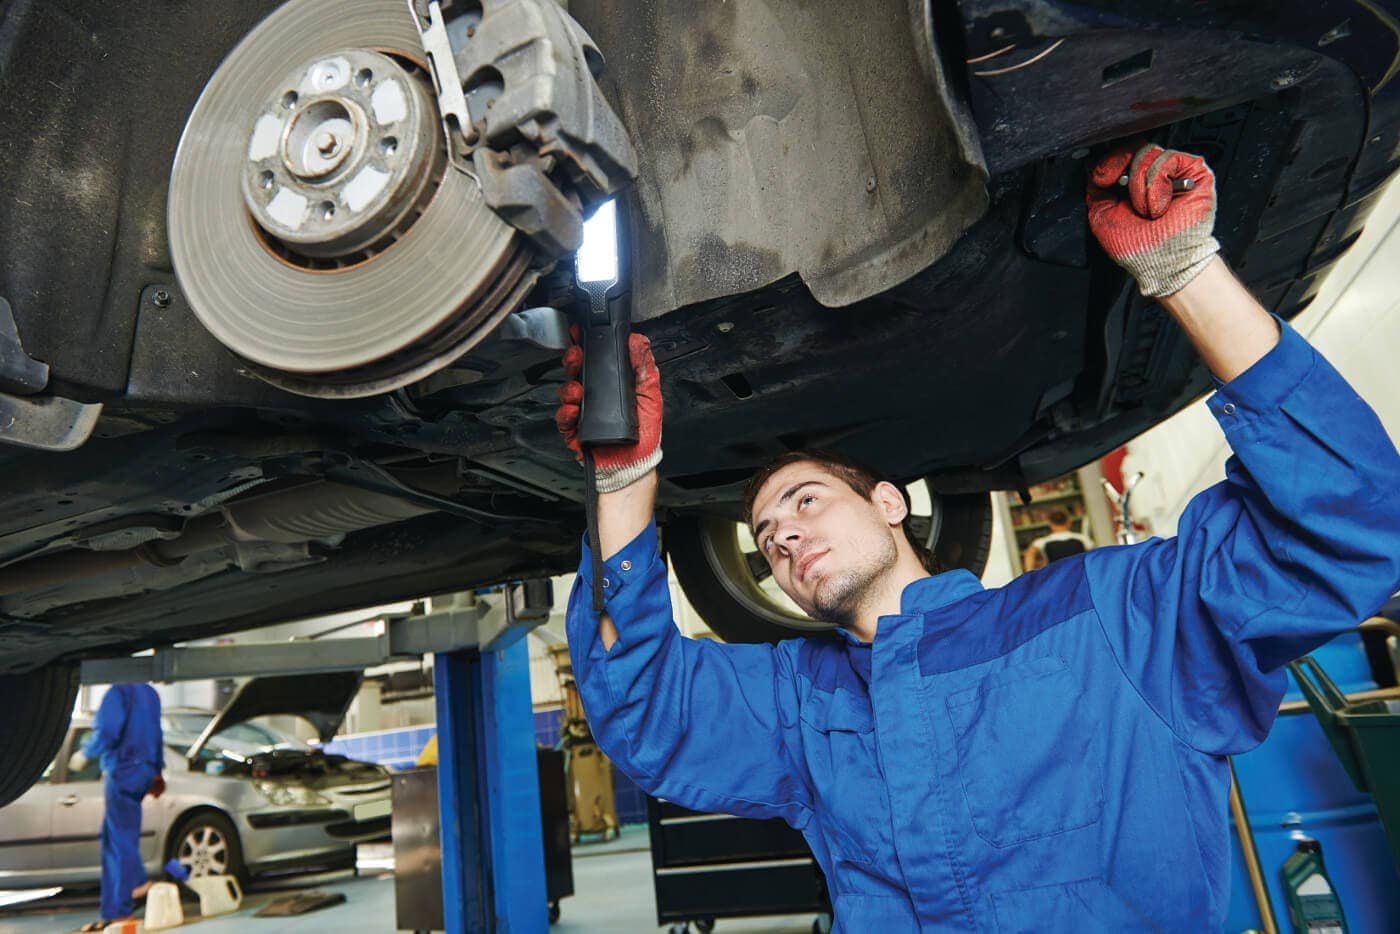 A mechanic inspecting brakes